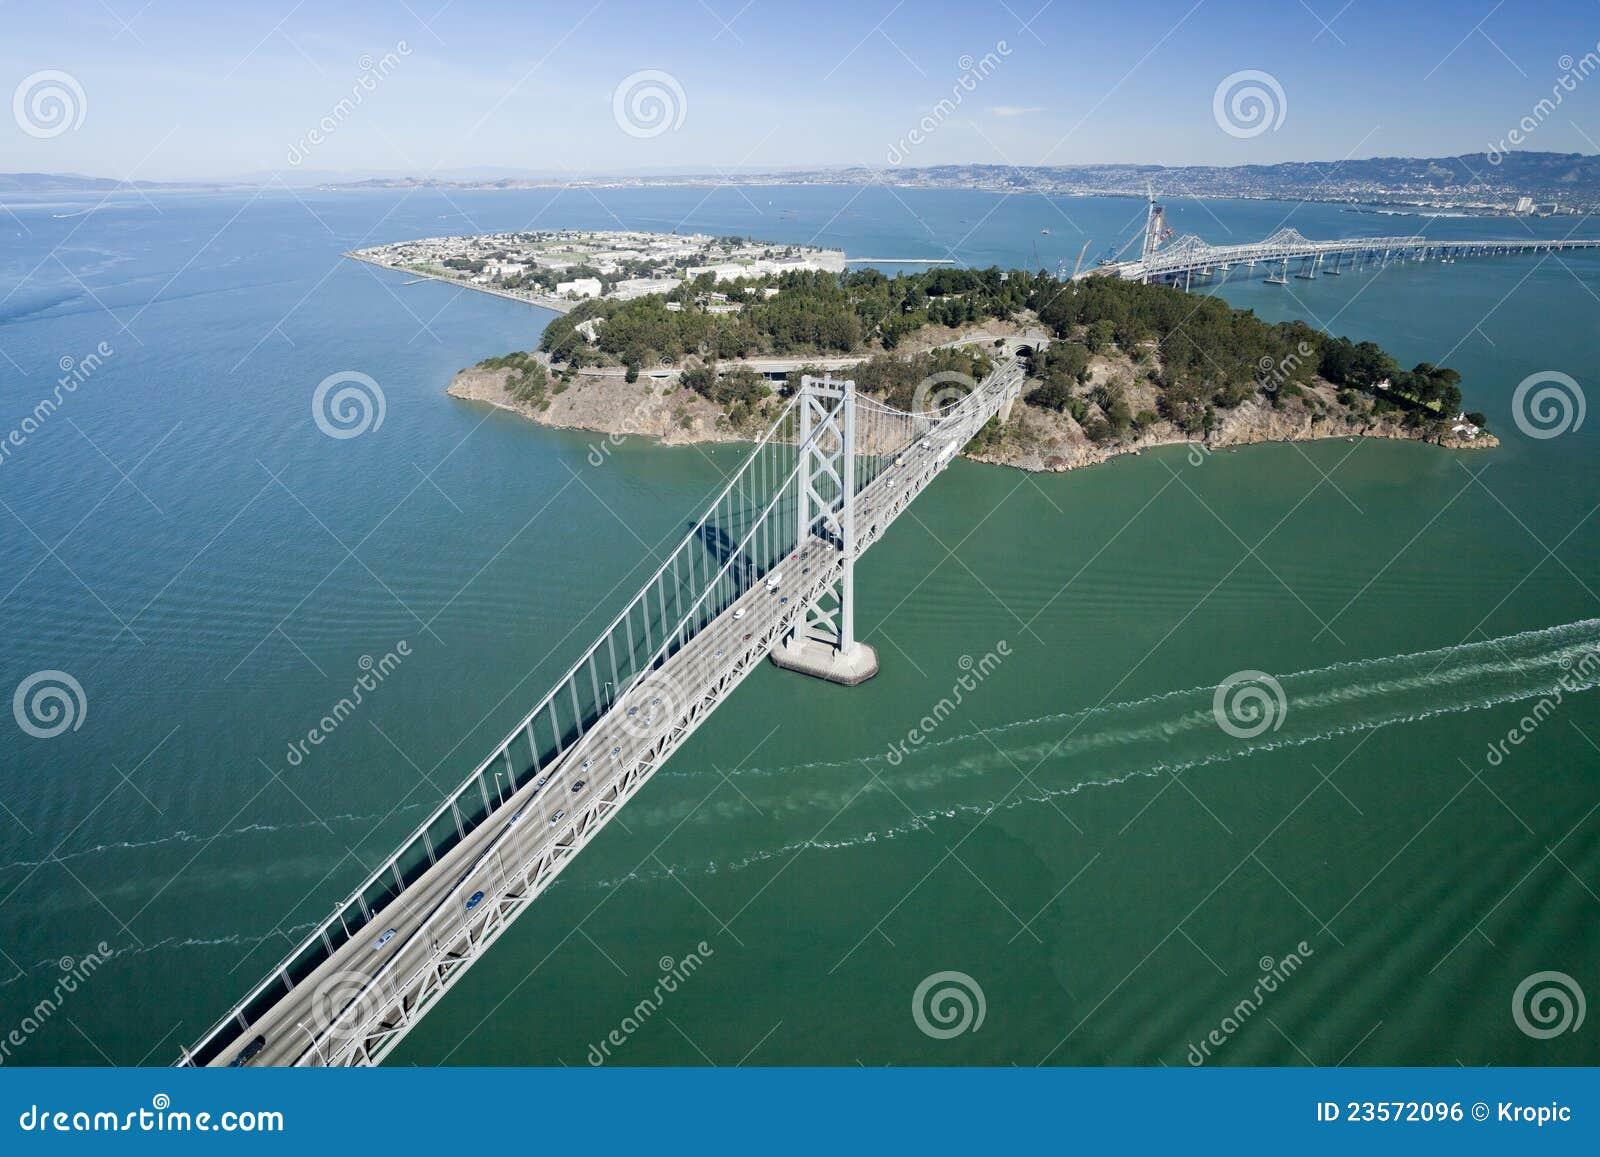 San Francisco Bay Bridge Aerial View Royalty